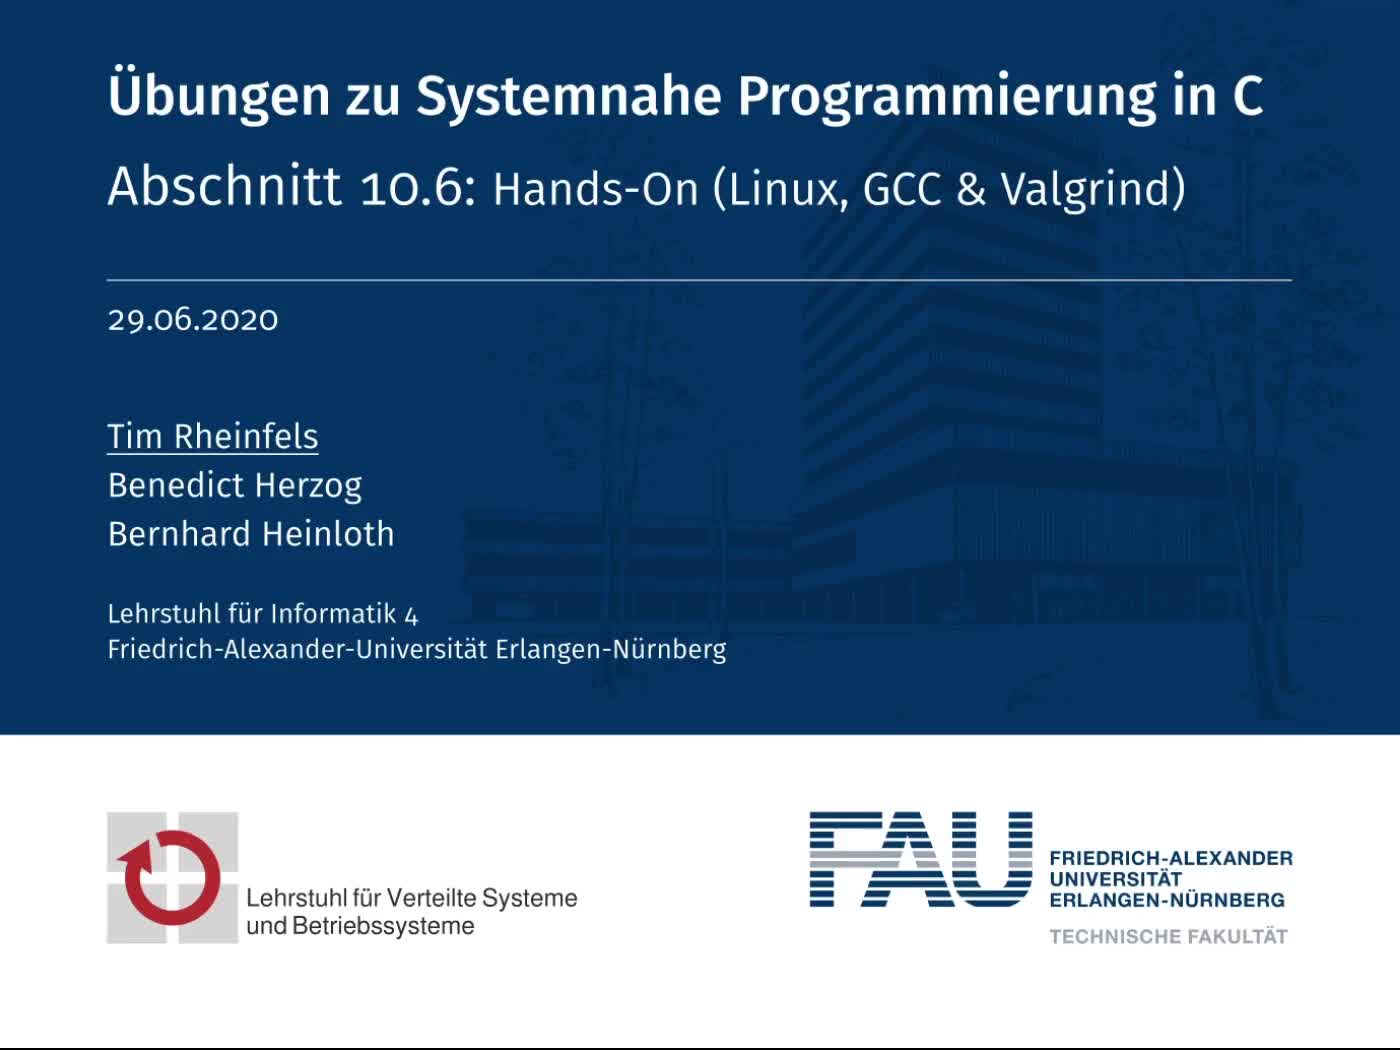 10.6: Hands-On (Linux, GCC & Valgrind) preview image